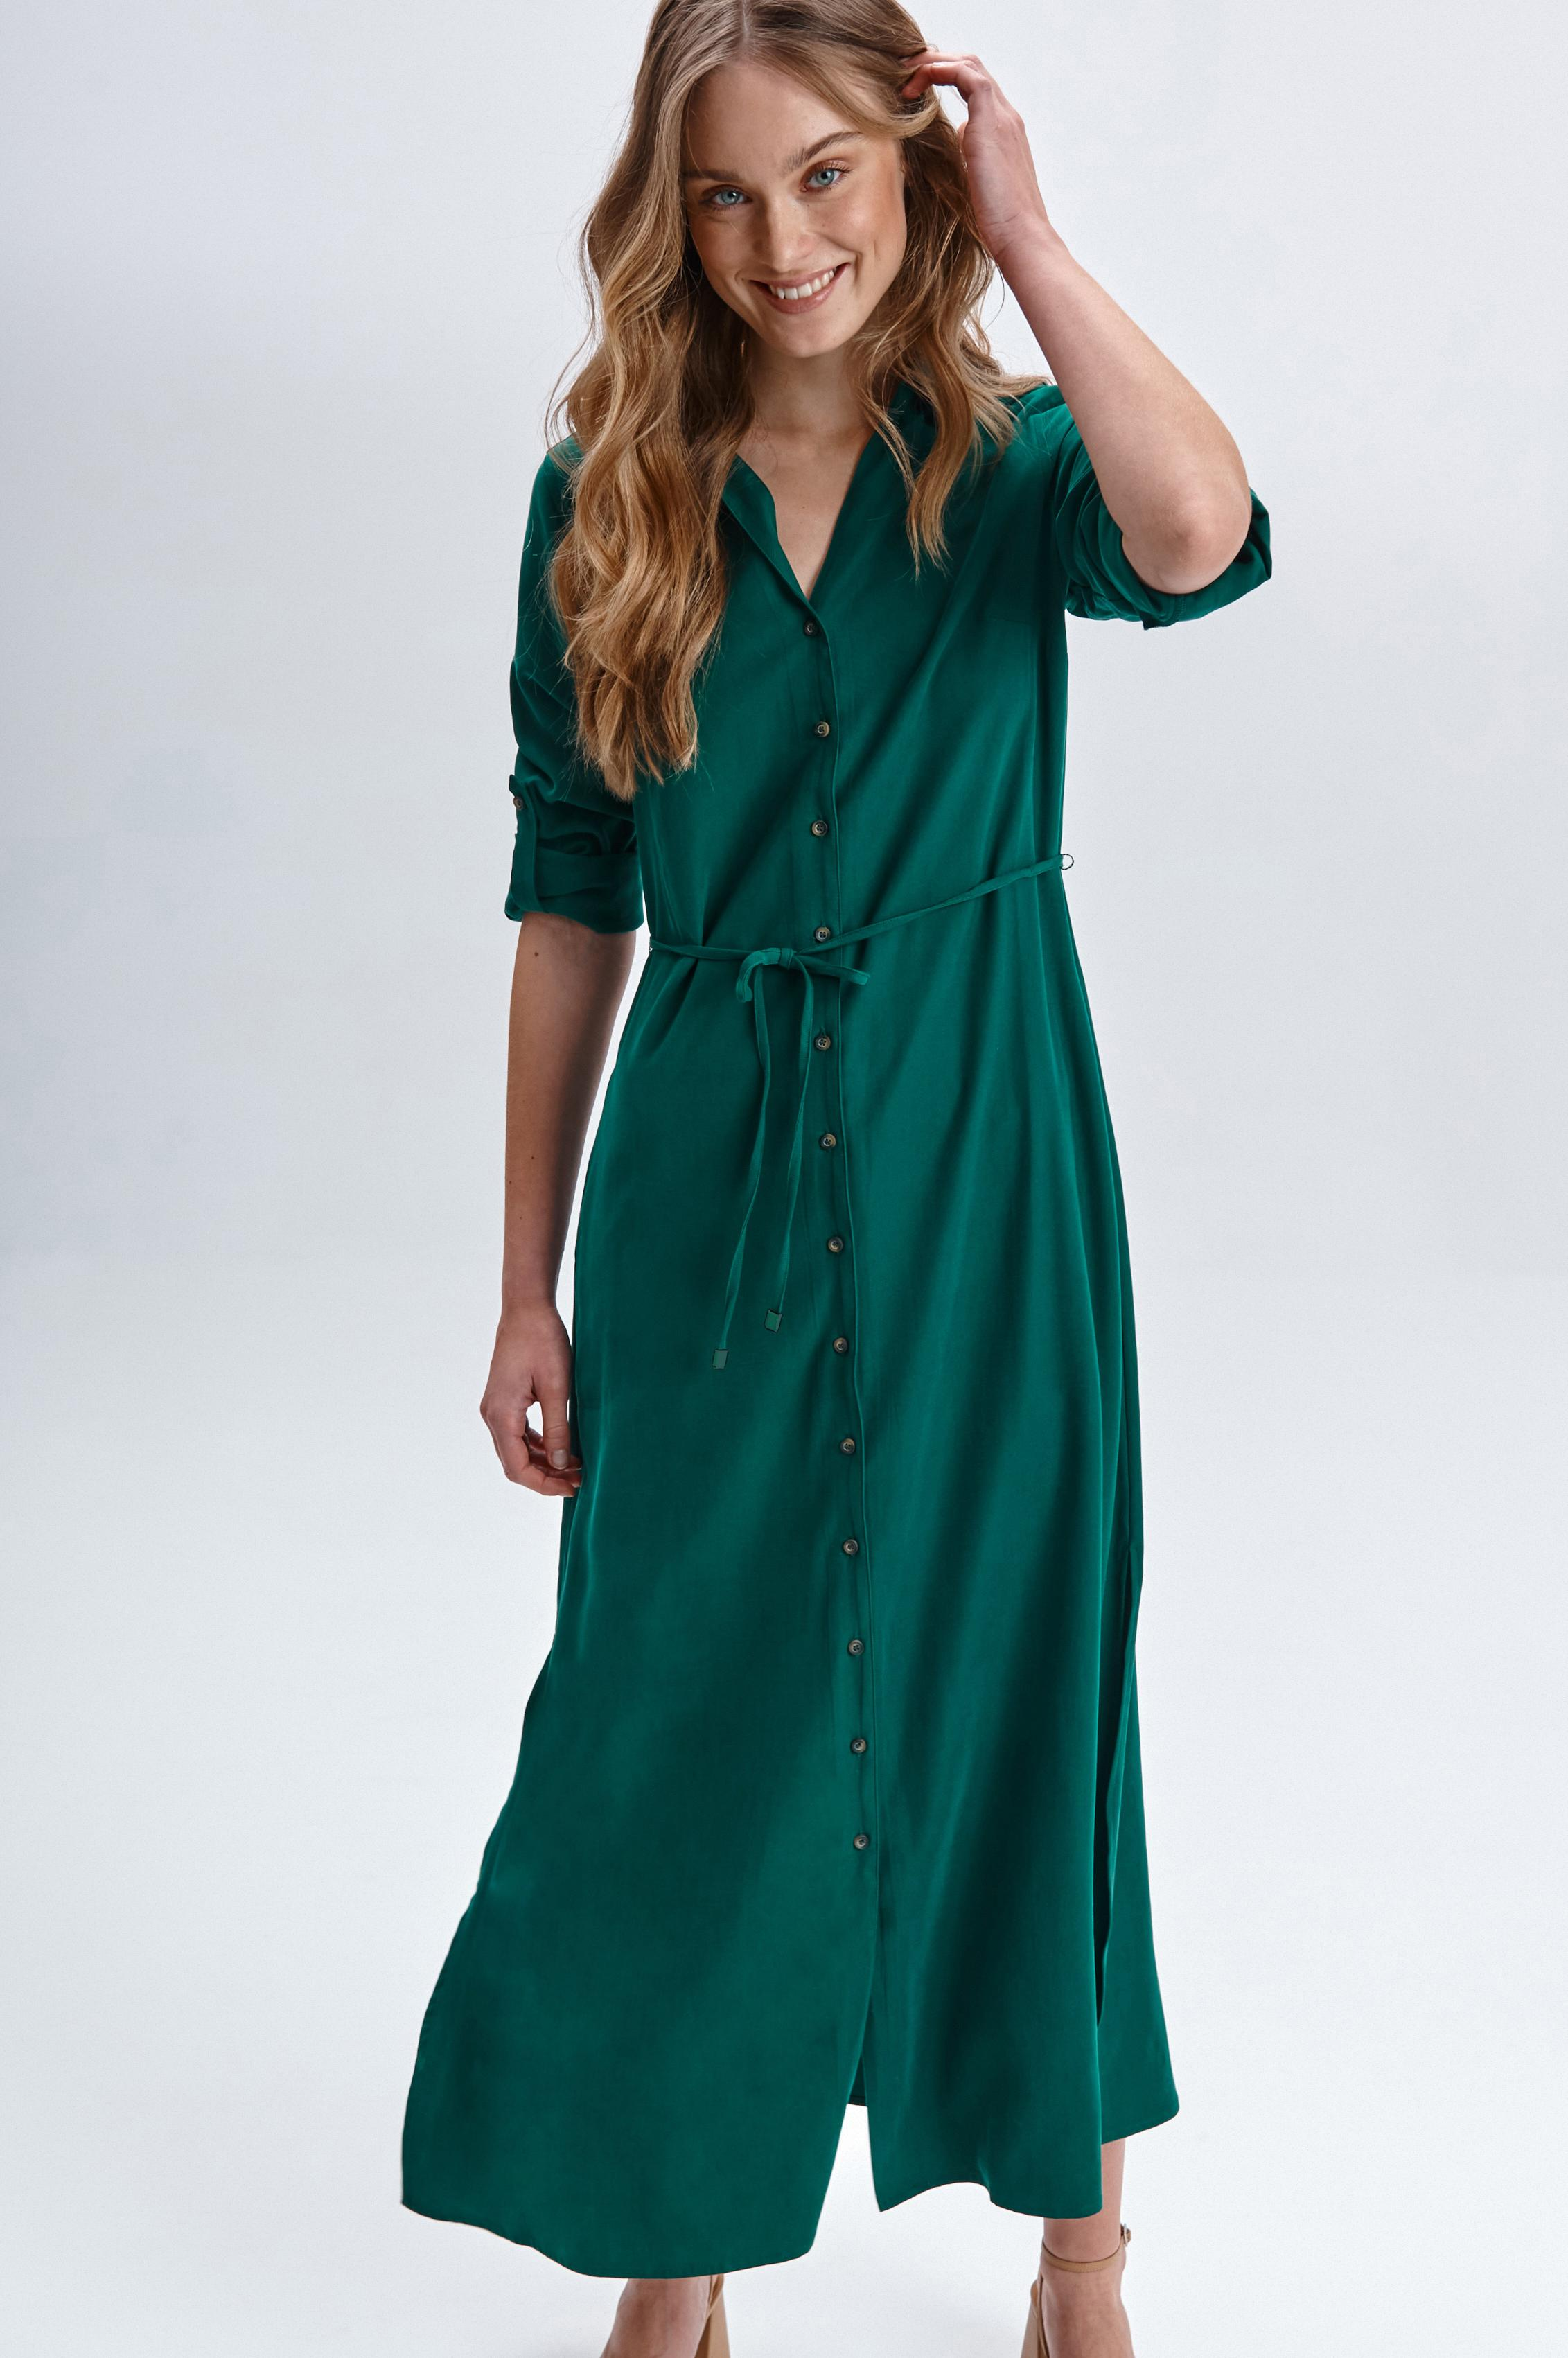 SHIRT-LIKE DRESS MOLONIA